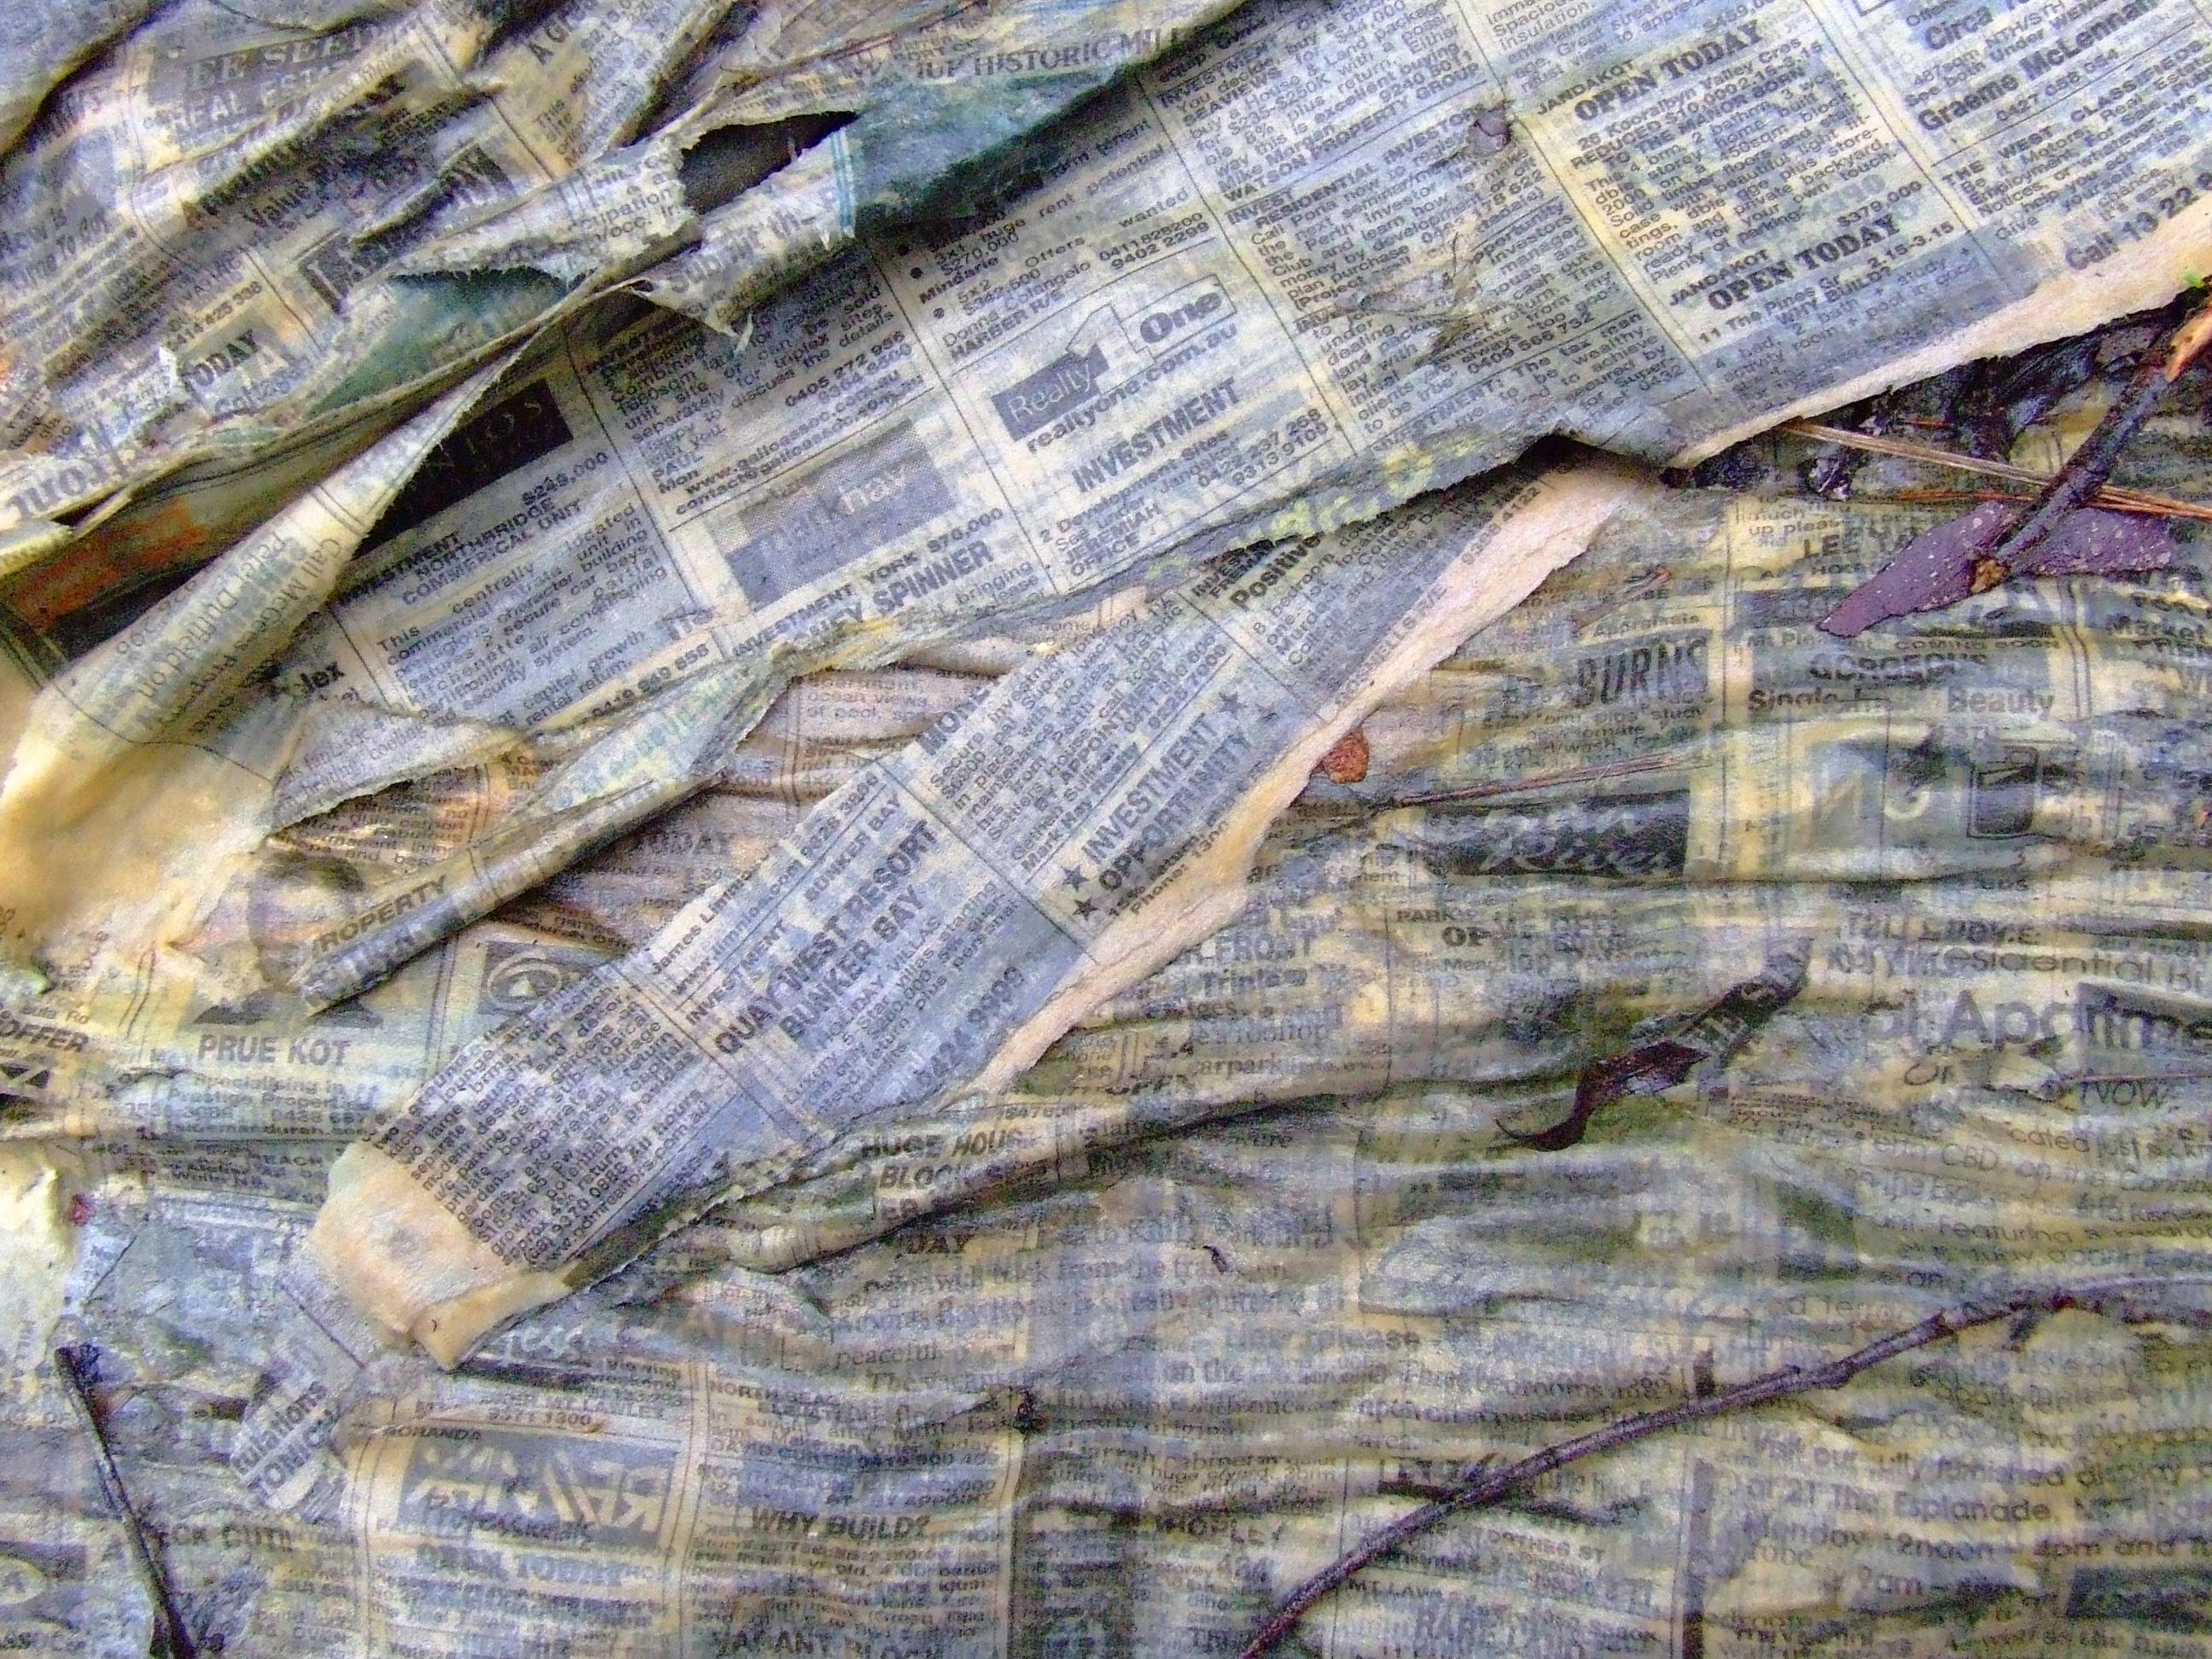 Wet Newspaper by dazzle-textures